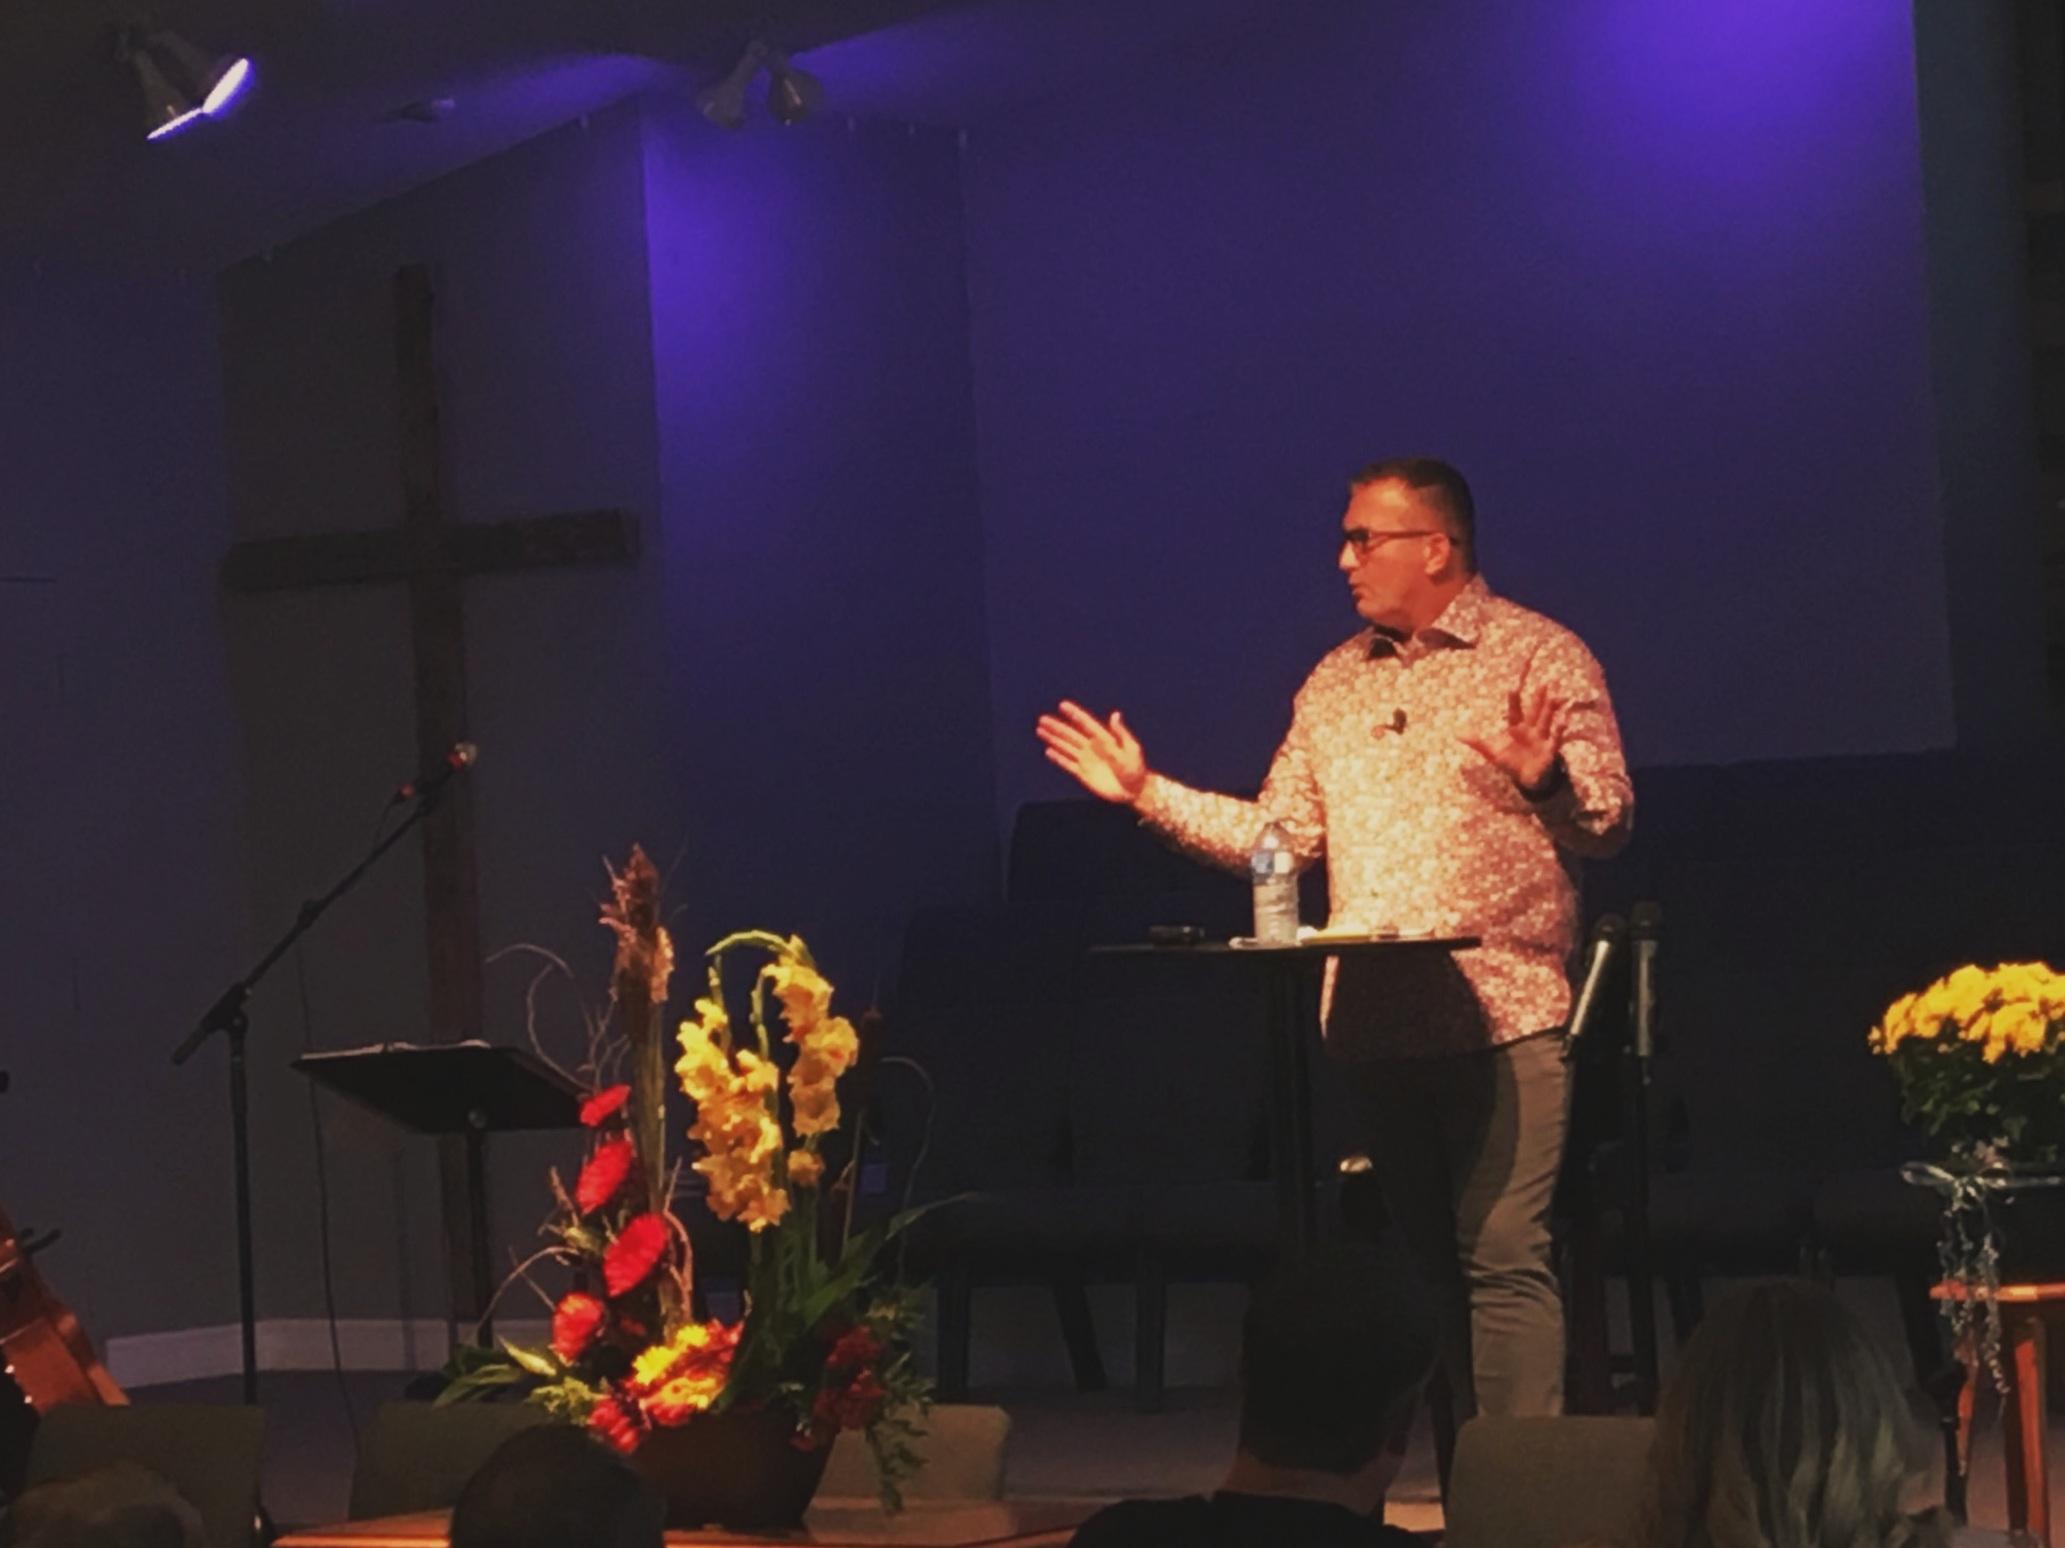 Pastor John Tremblett